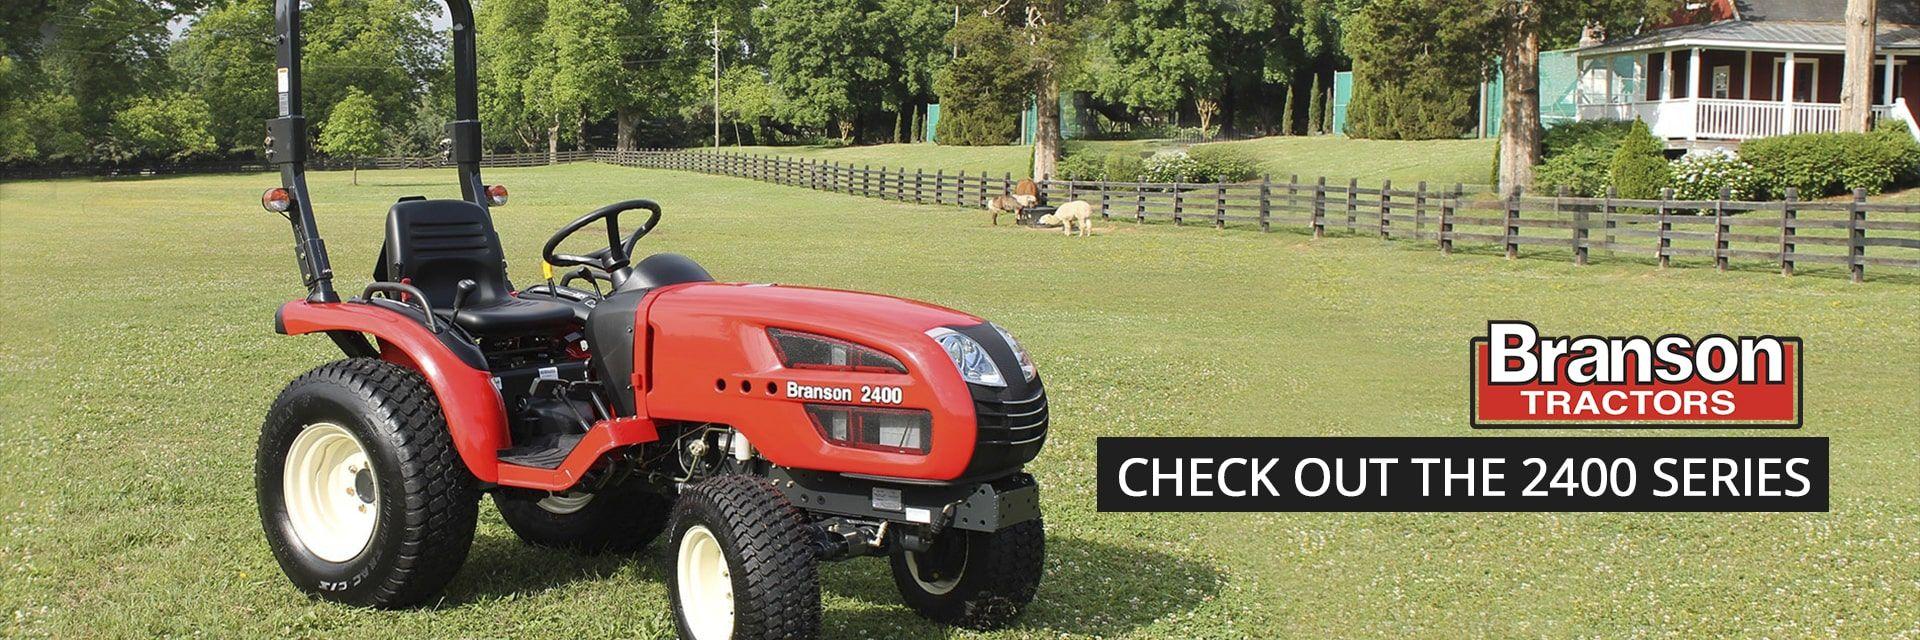 Branson Tractor 2400 Series